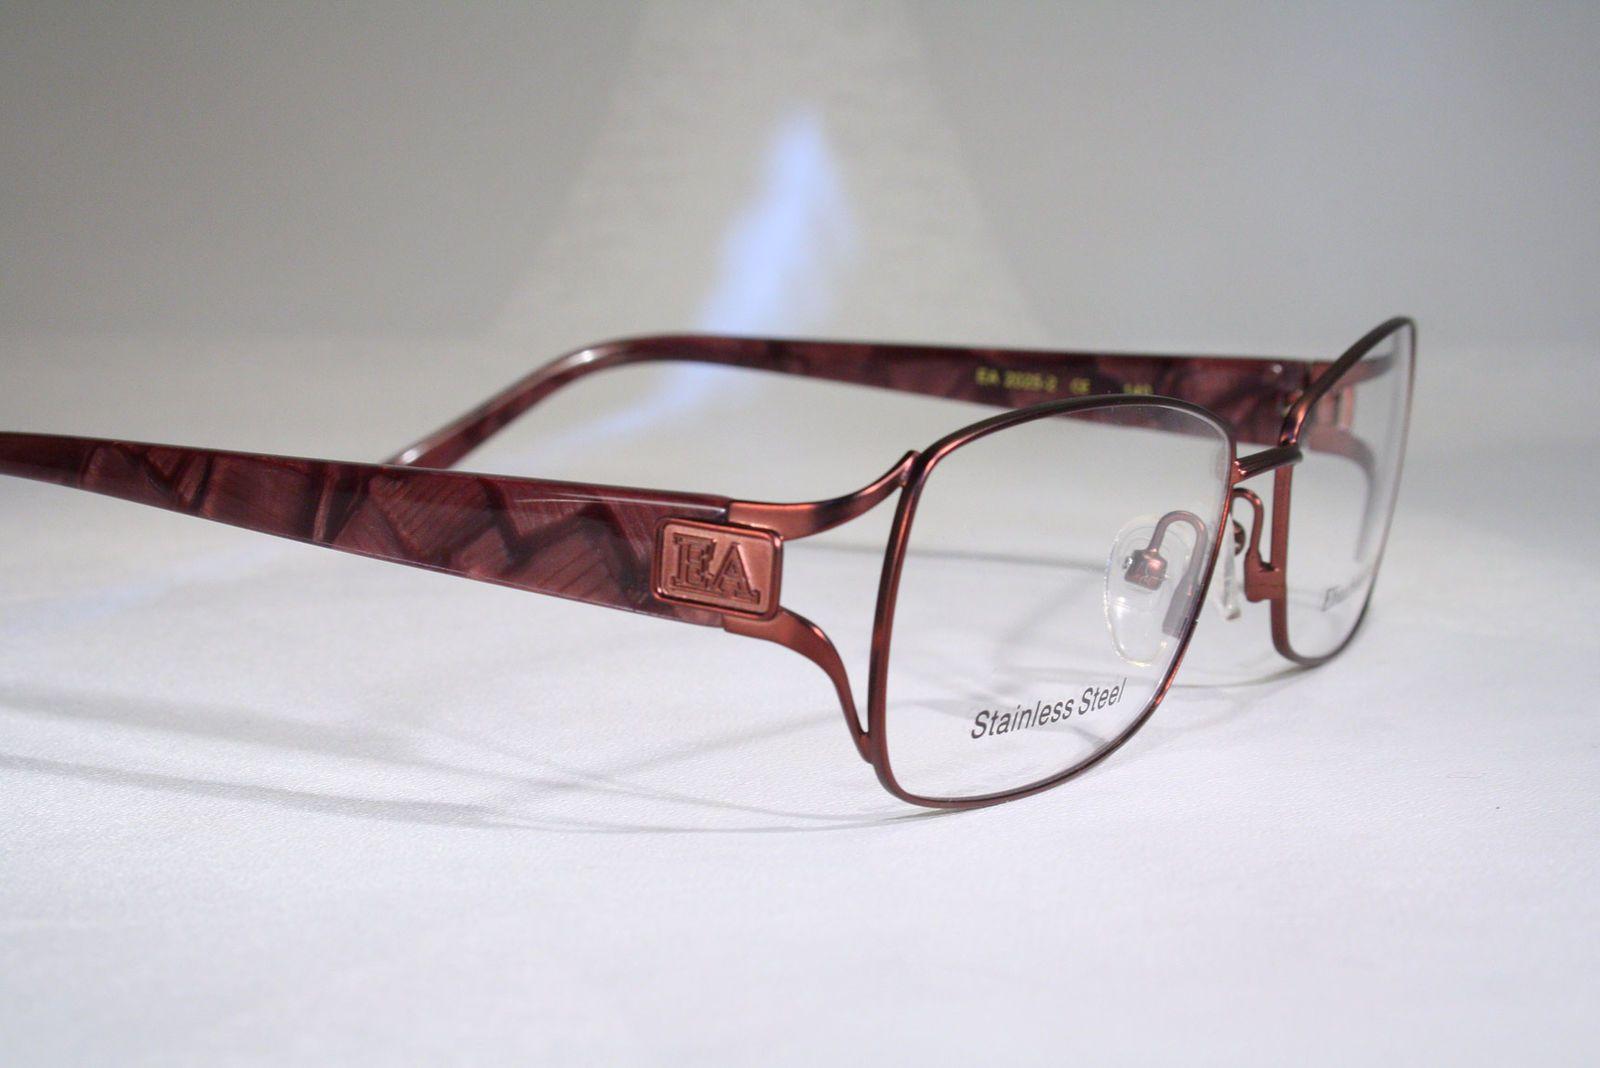 5bebd2b85 New ELIZABETH ARDEN EA 2025-2 Women's Burgundy Optical Eyeglass Frames  Glasses @ eBay (RipVanW)